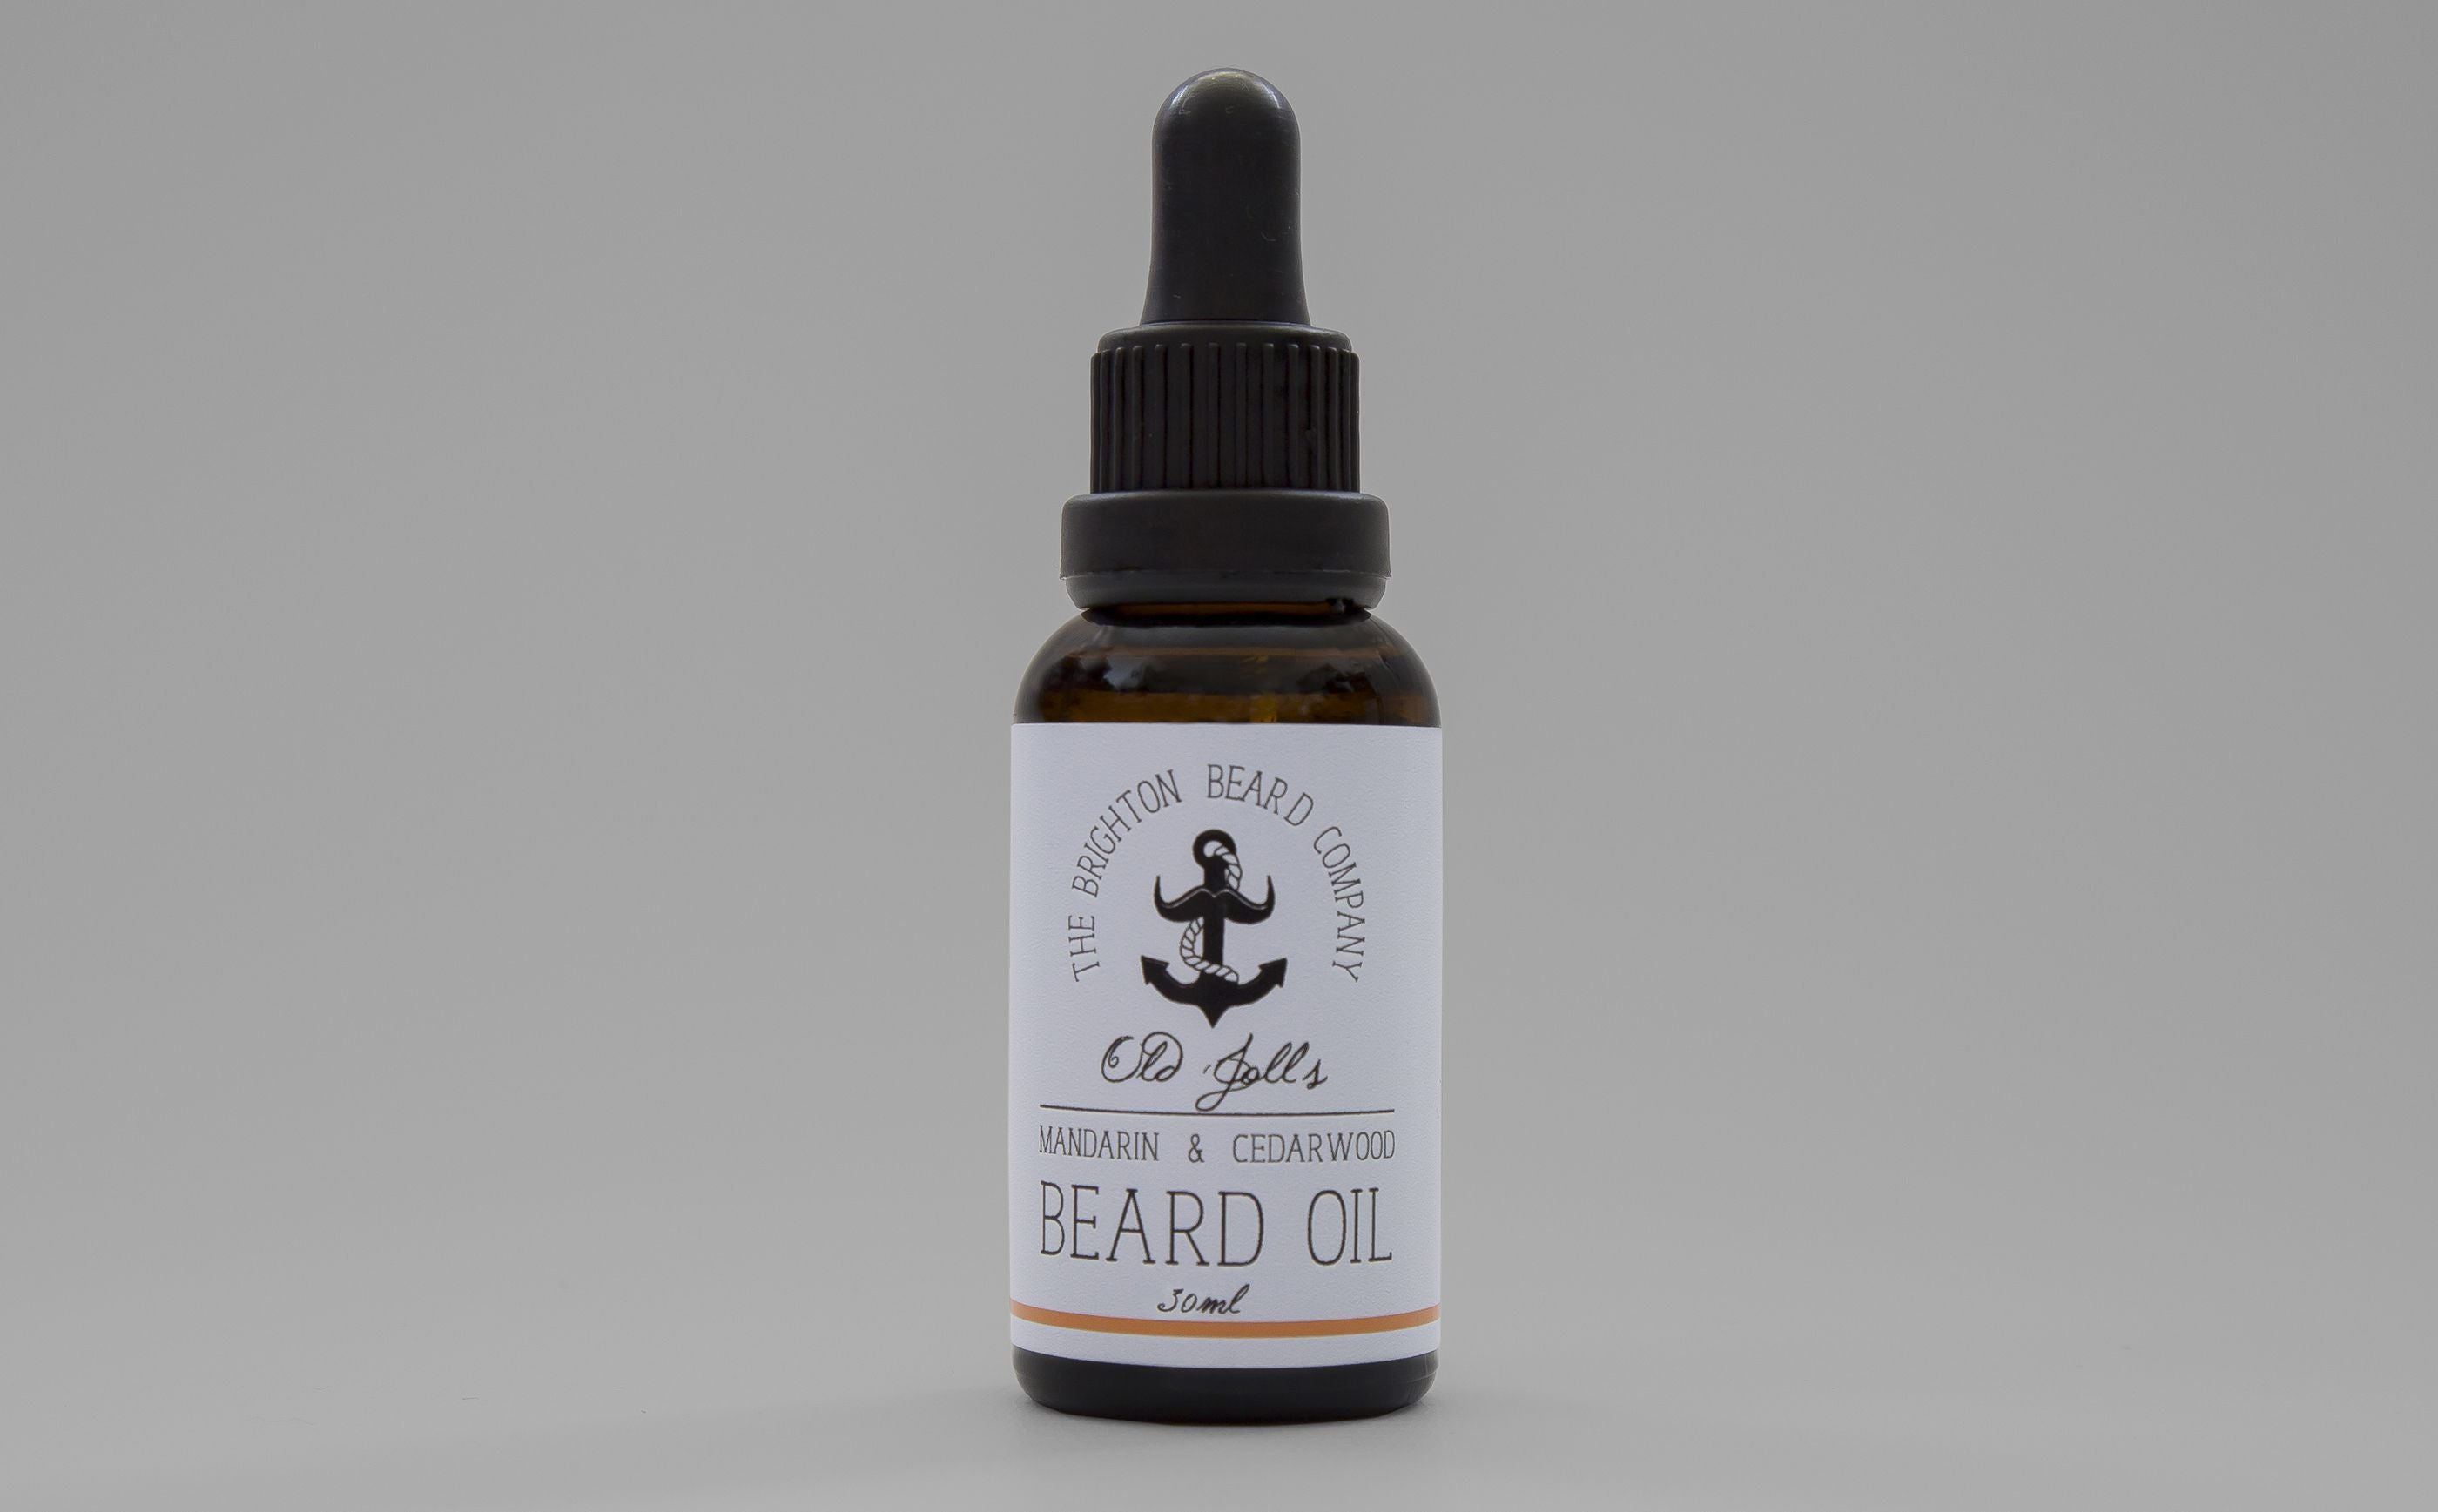 11 best beard oils | The Independent